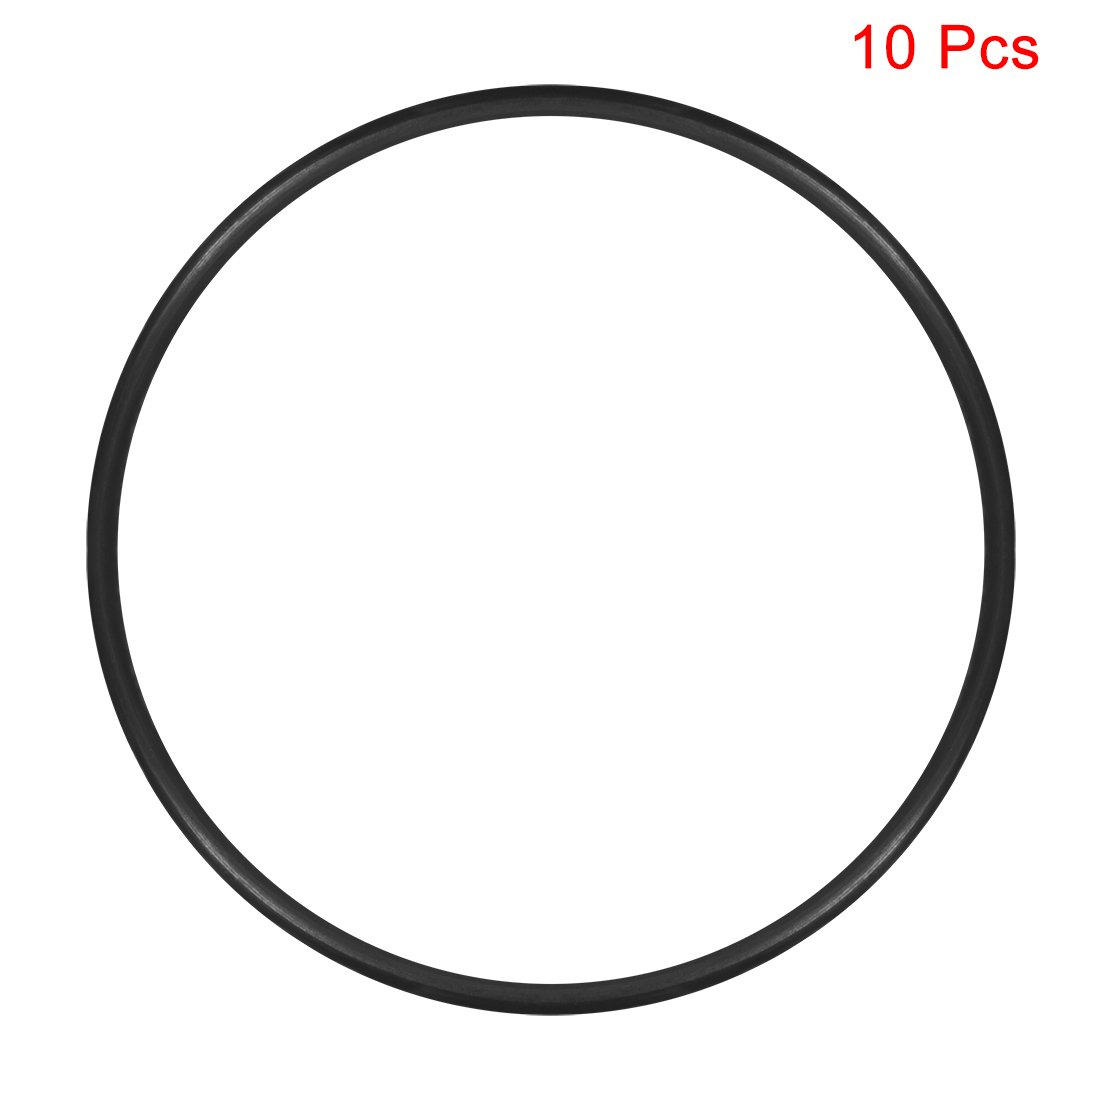 uxcell O-Ringe Nitril Gummi 45/mm-70/mm OD 2/mm dick Seal Ring Dichtungsband Dichtungen 42mmx46mmx2mm